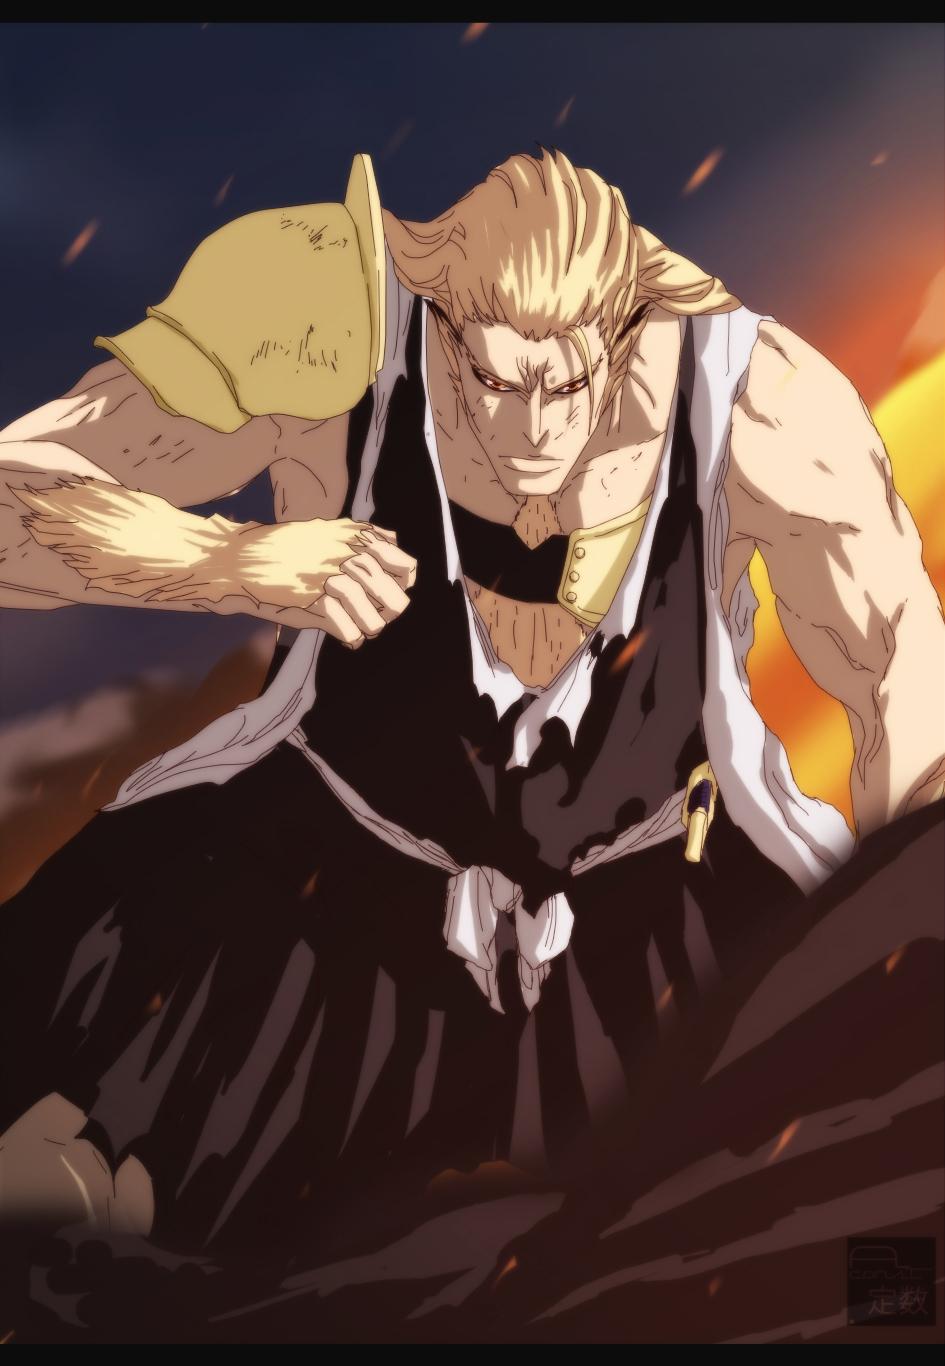 Anime Bleach Imágenes Sajin Komamura Hd Fondo De Pantalla And